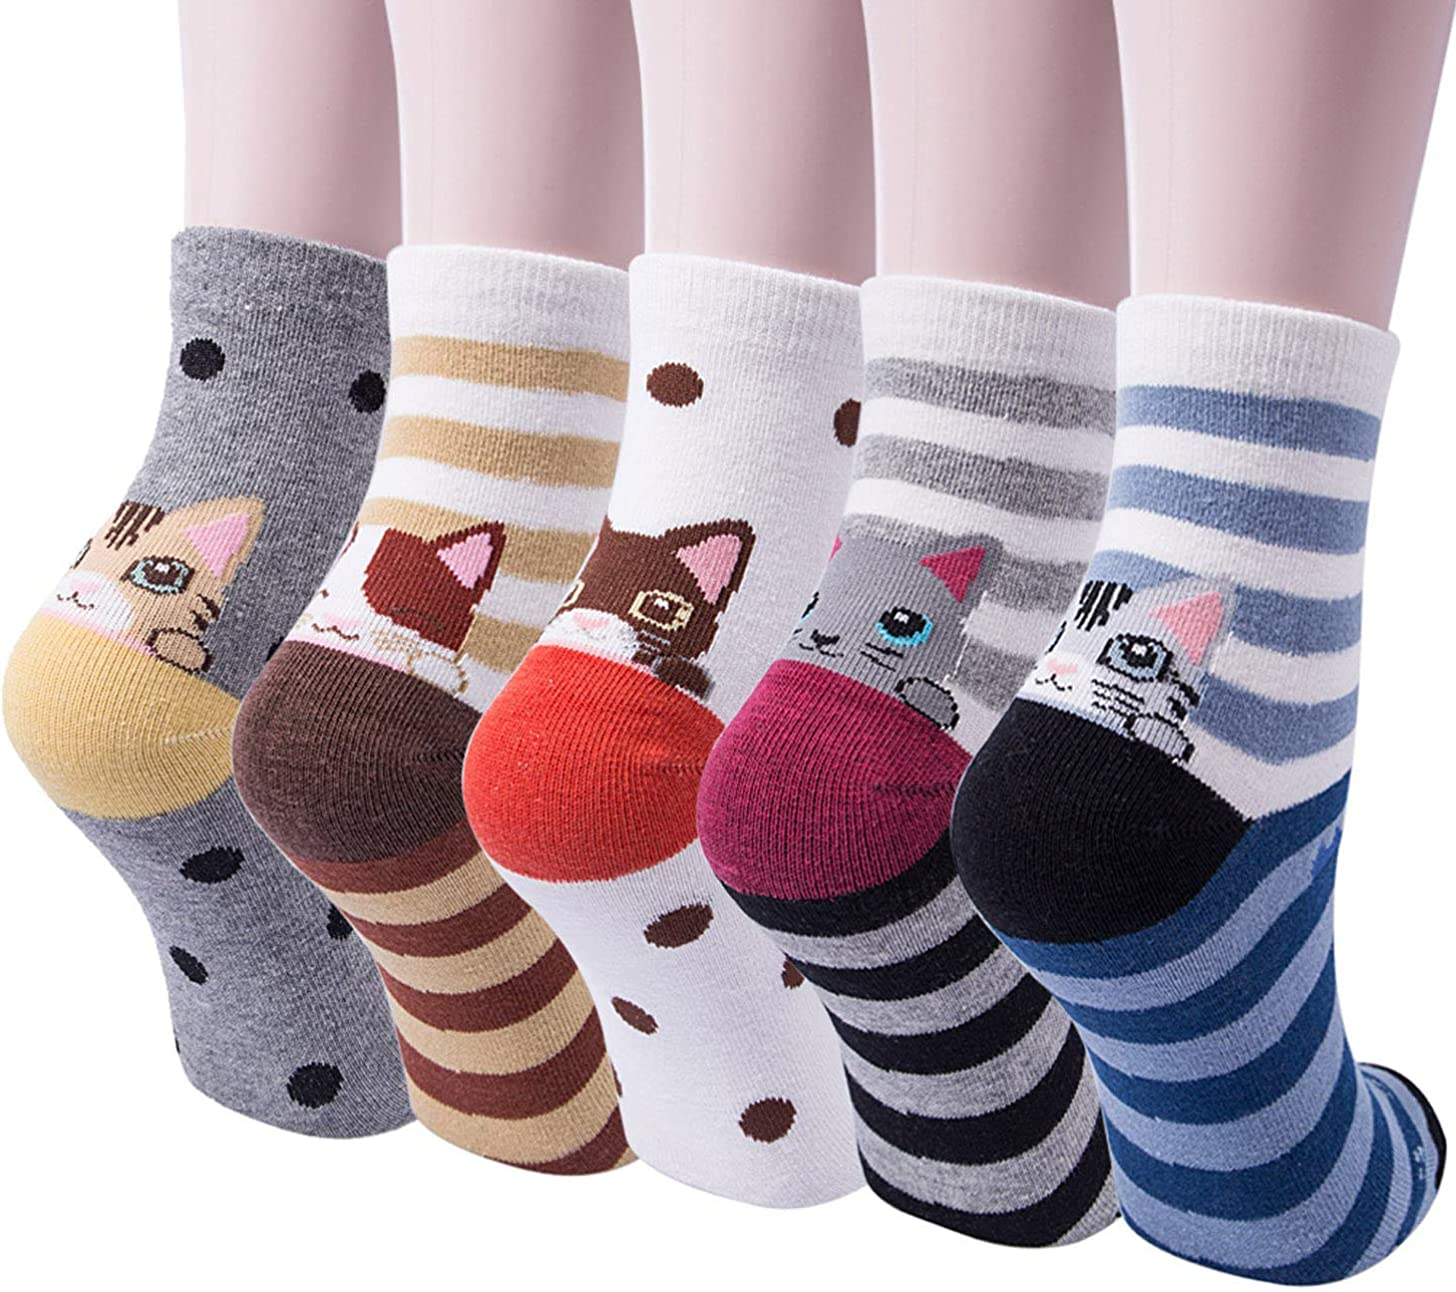 Panvbo 5 Pairs Womens Cute Animal Socks Cat Dog Funny Casual Cotton Socks